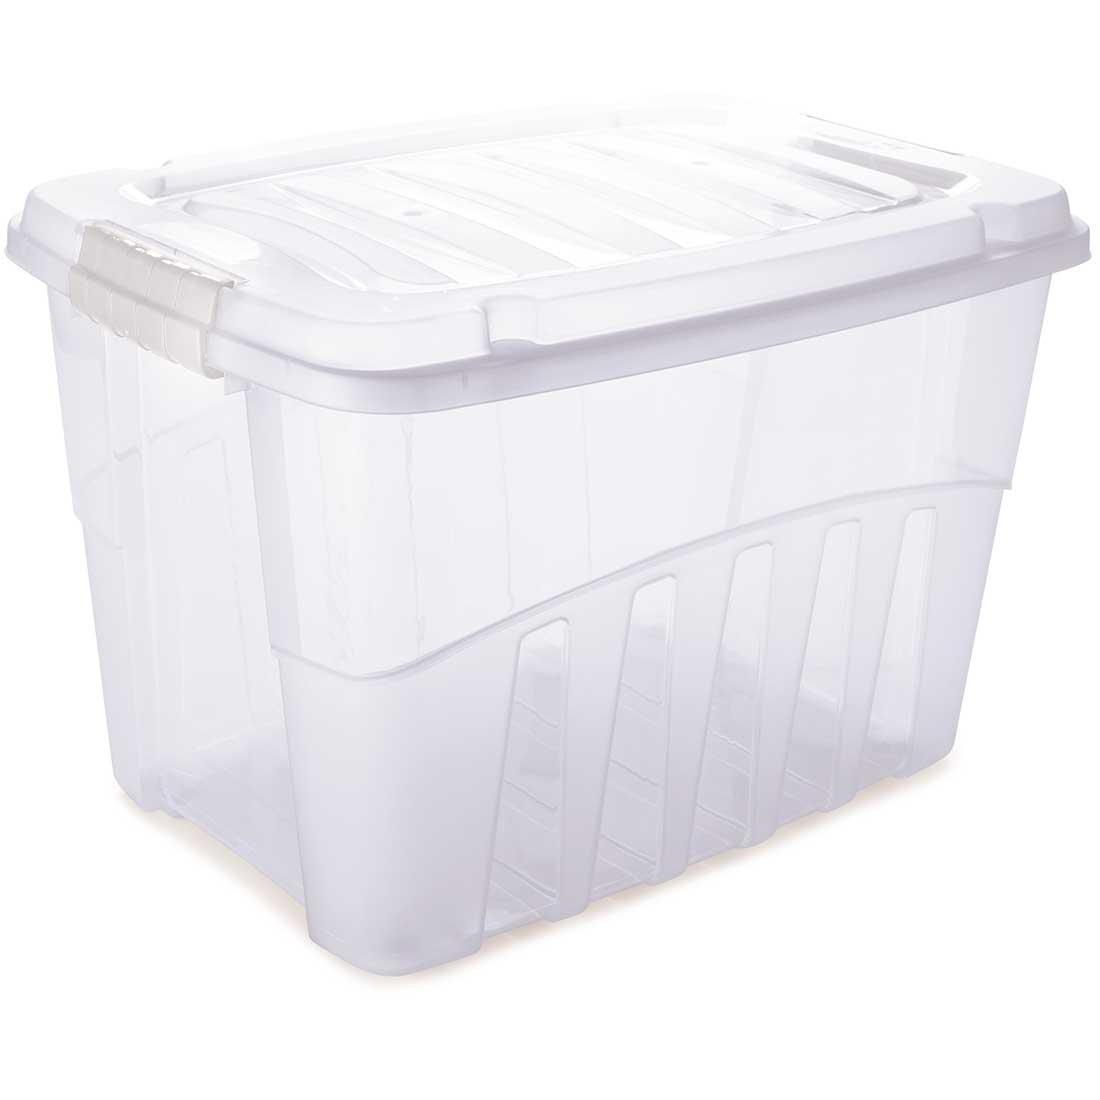 Caixa organizadora baixa Gran Box 78 Litros transparente